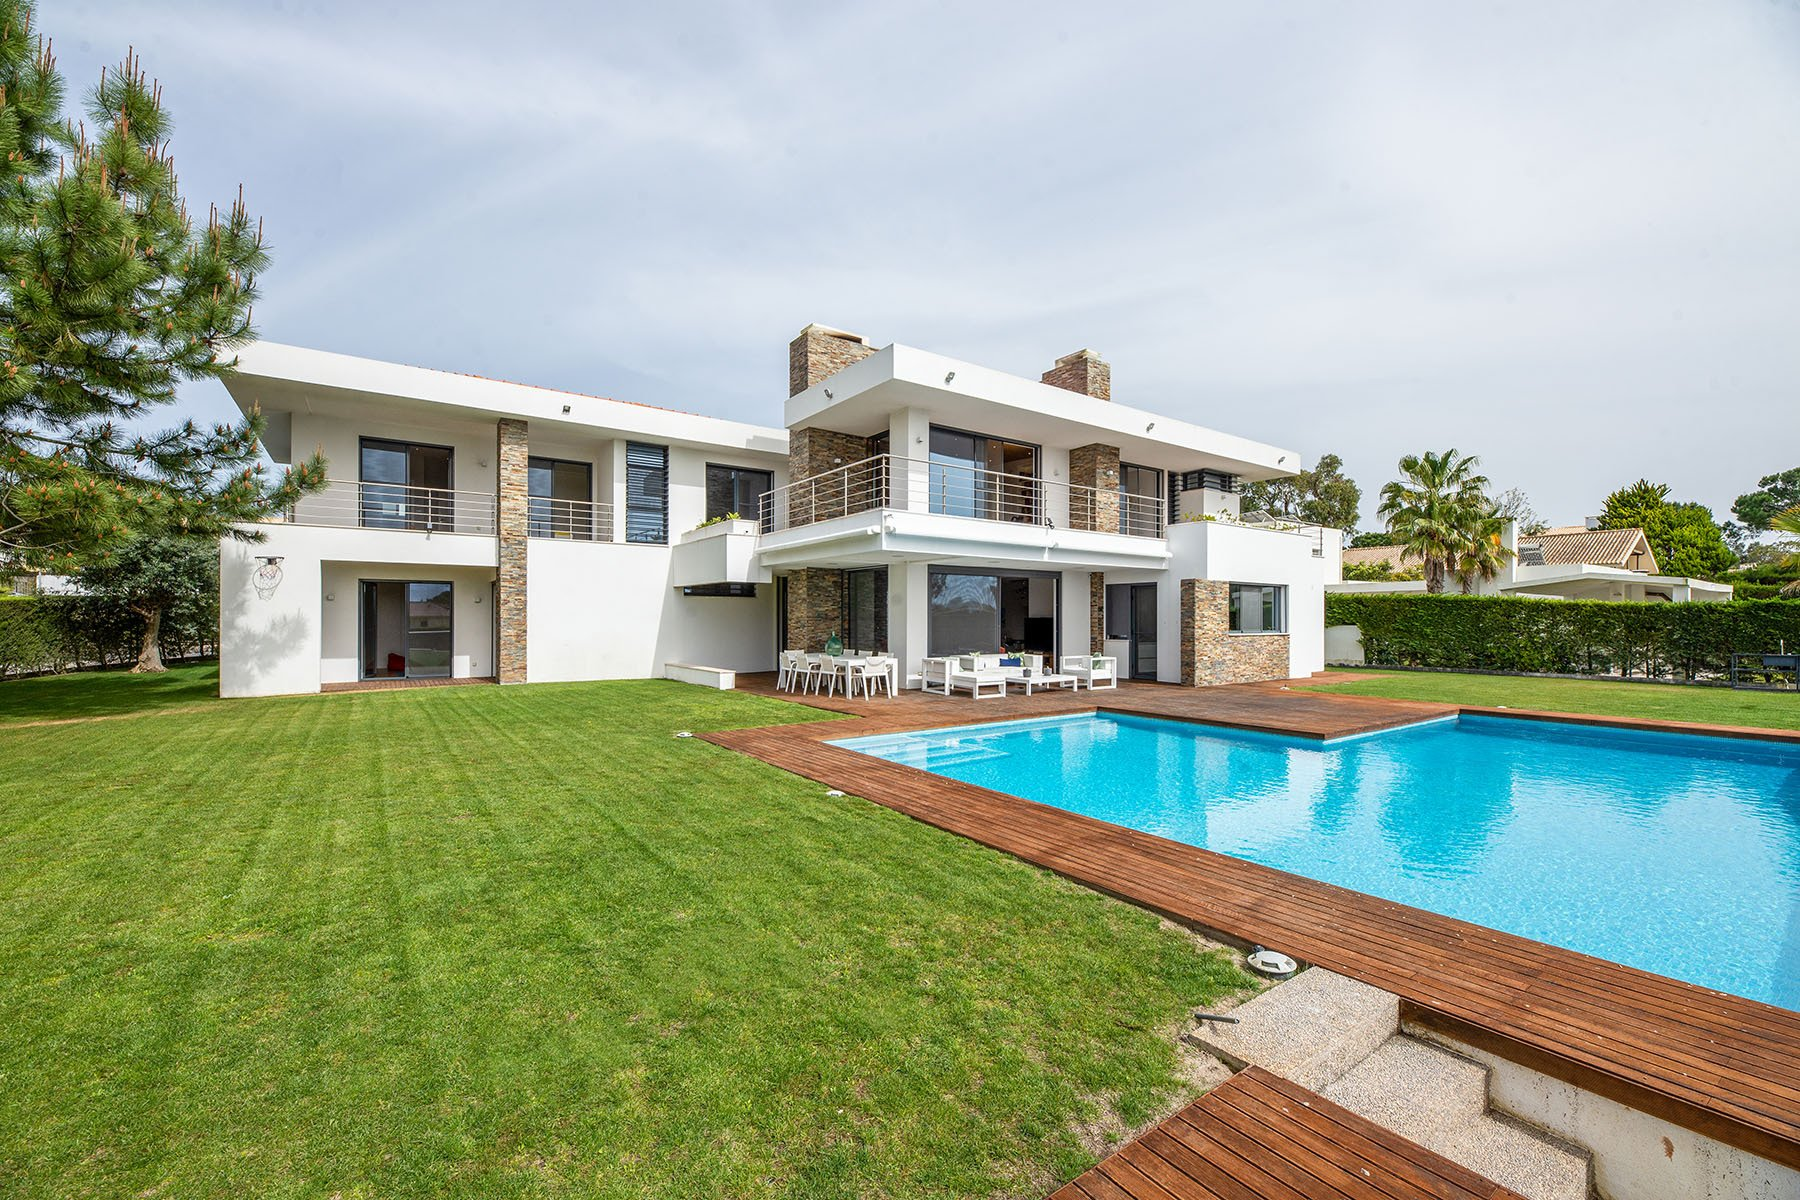 Villa in Grândola, Setubal, Portugal 1 - 11443867